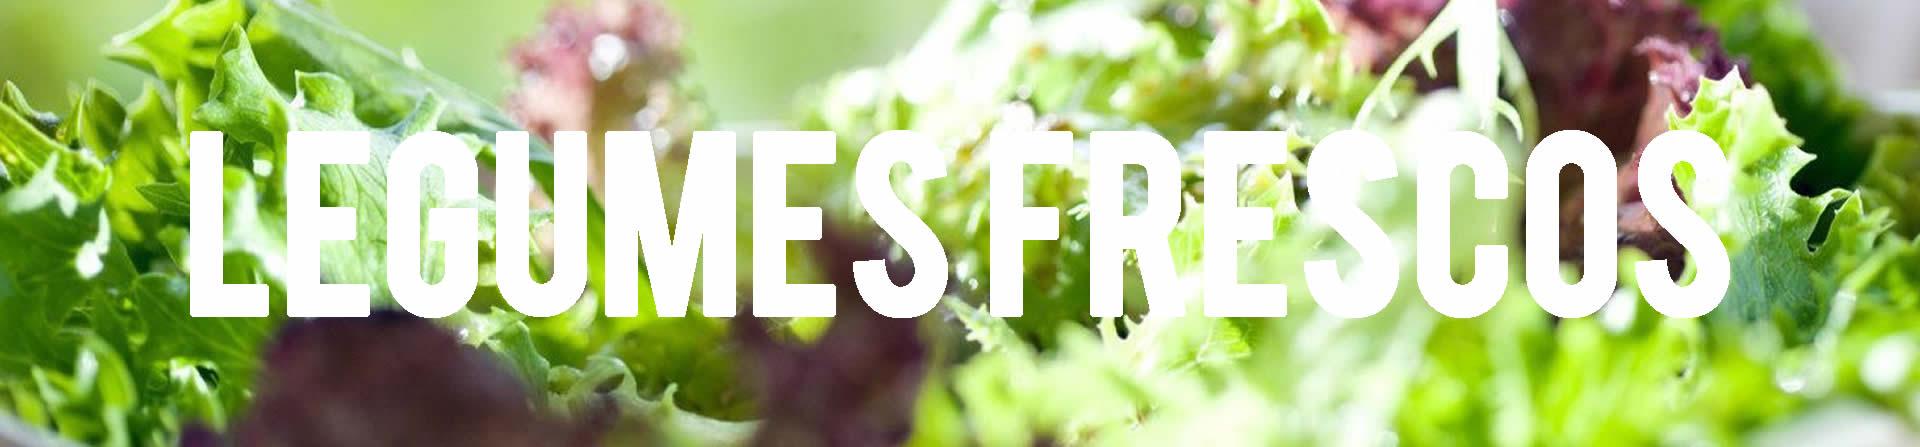 legumes_frescos